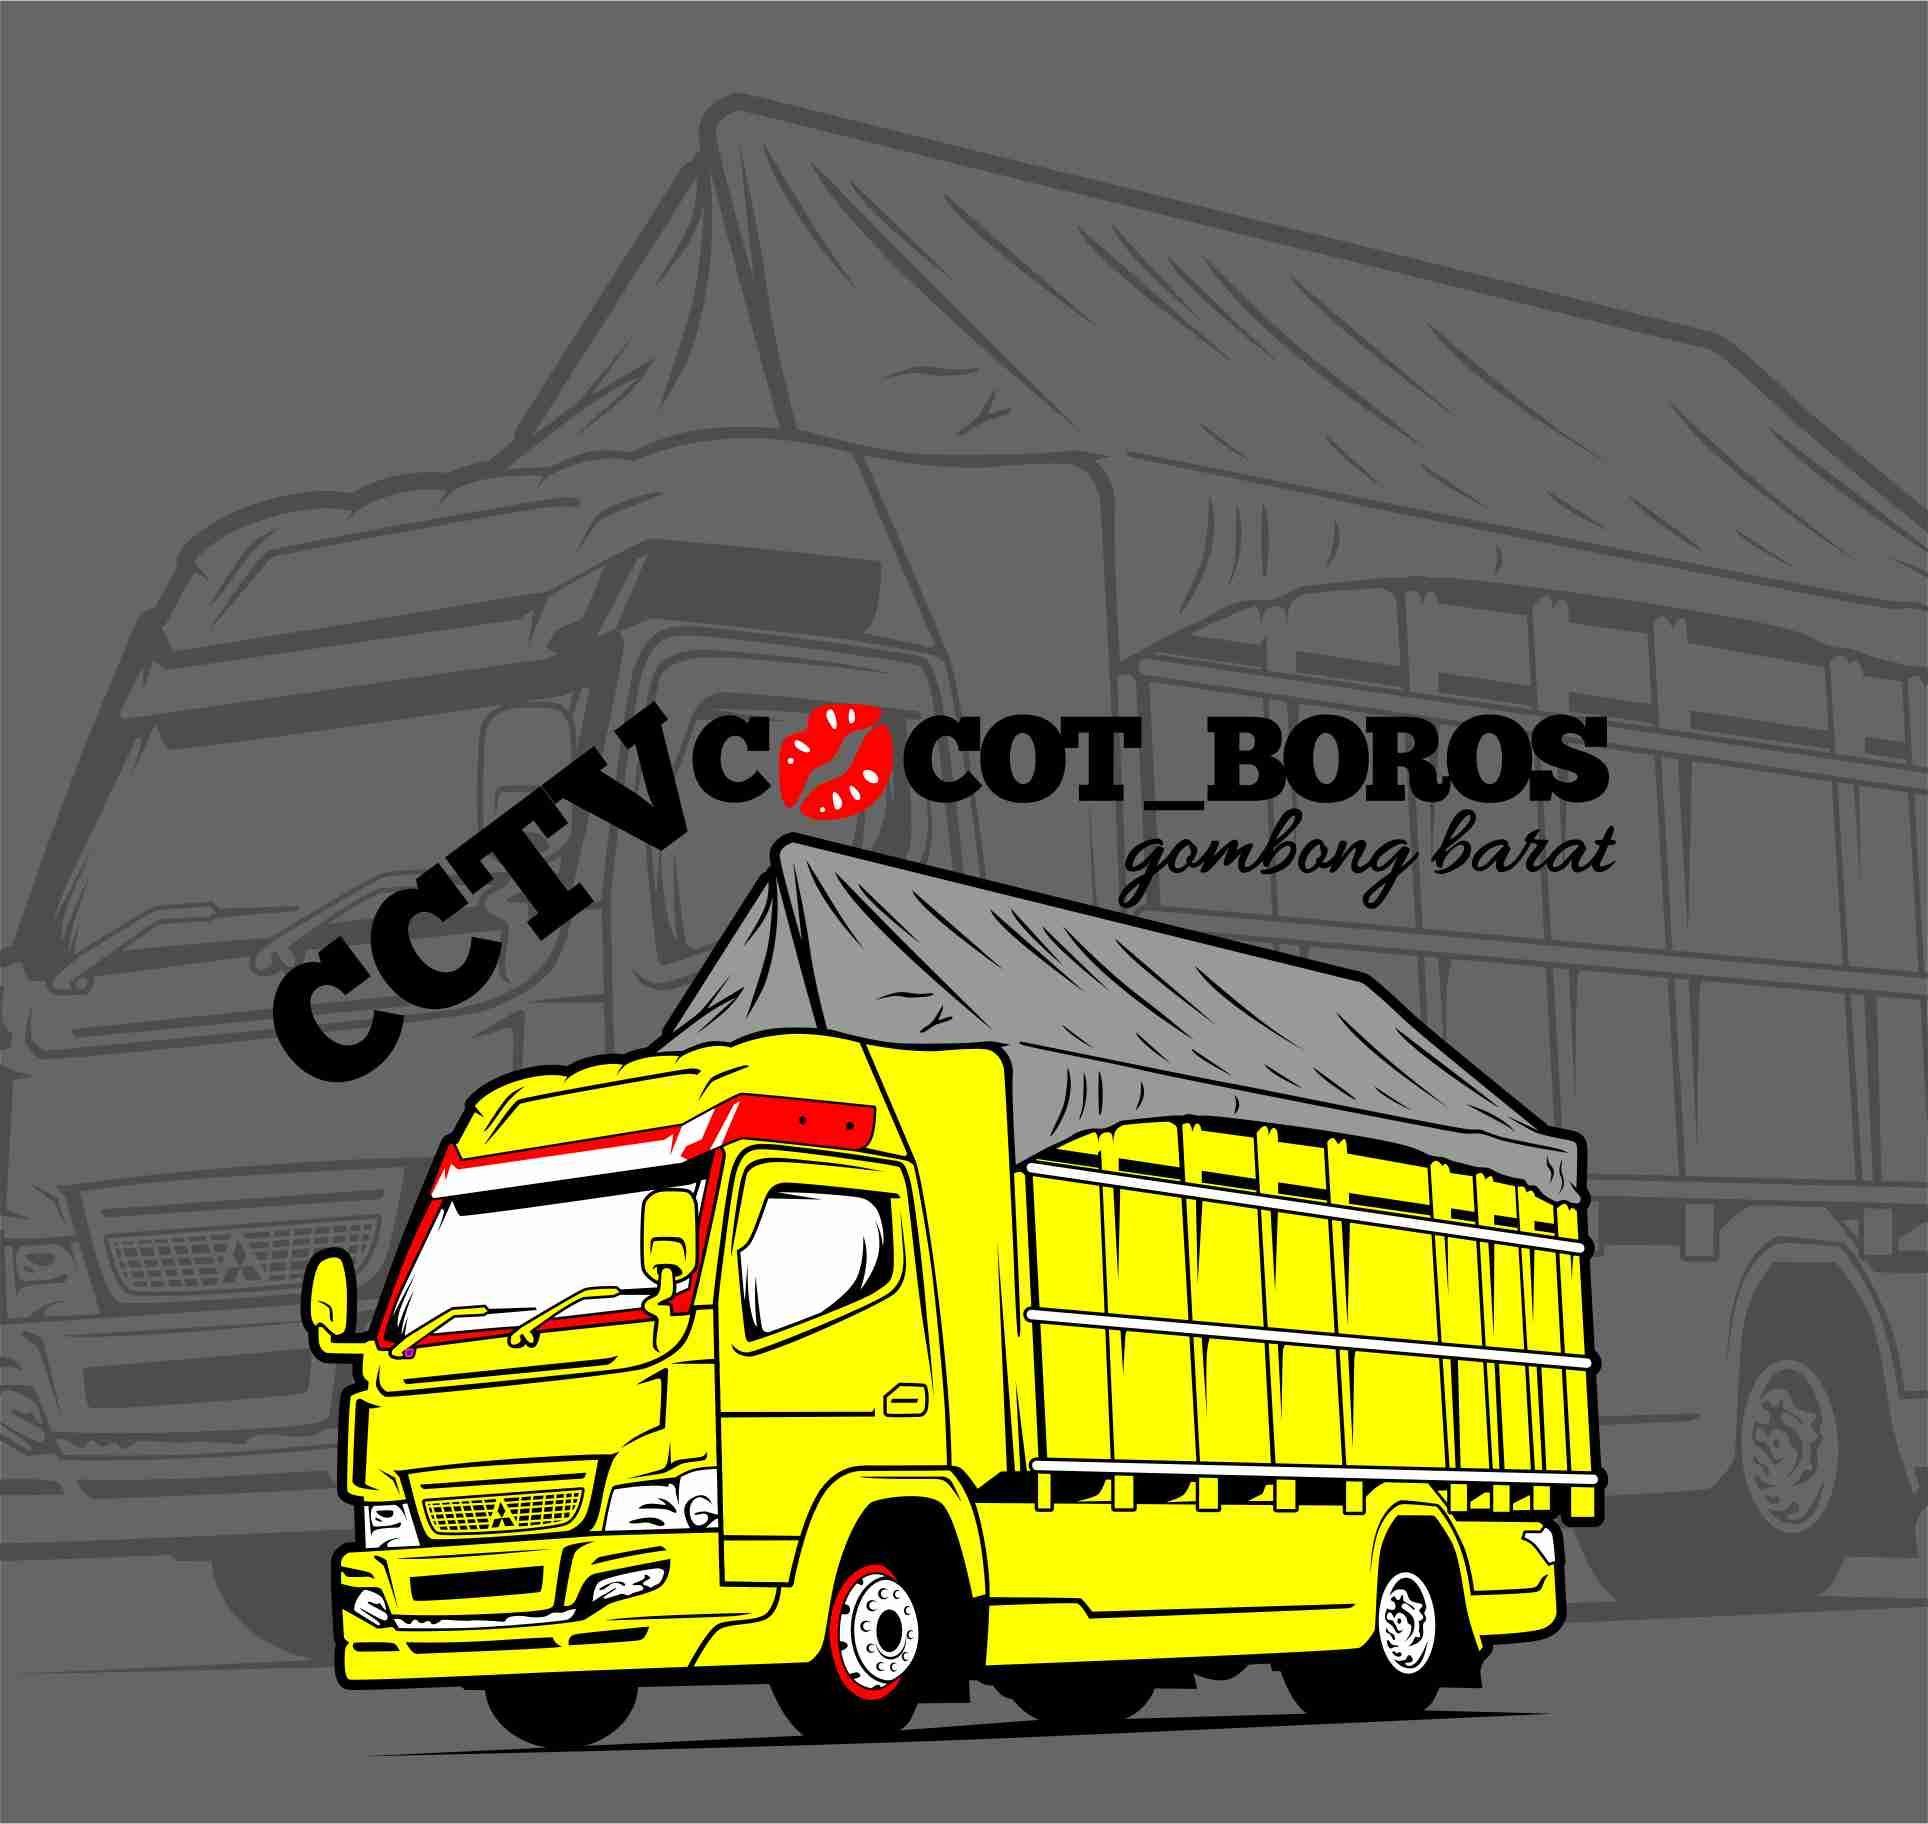 Truk Vector Cctv Cocot Boros Mobil Desain Logo Modifikasi Mobil